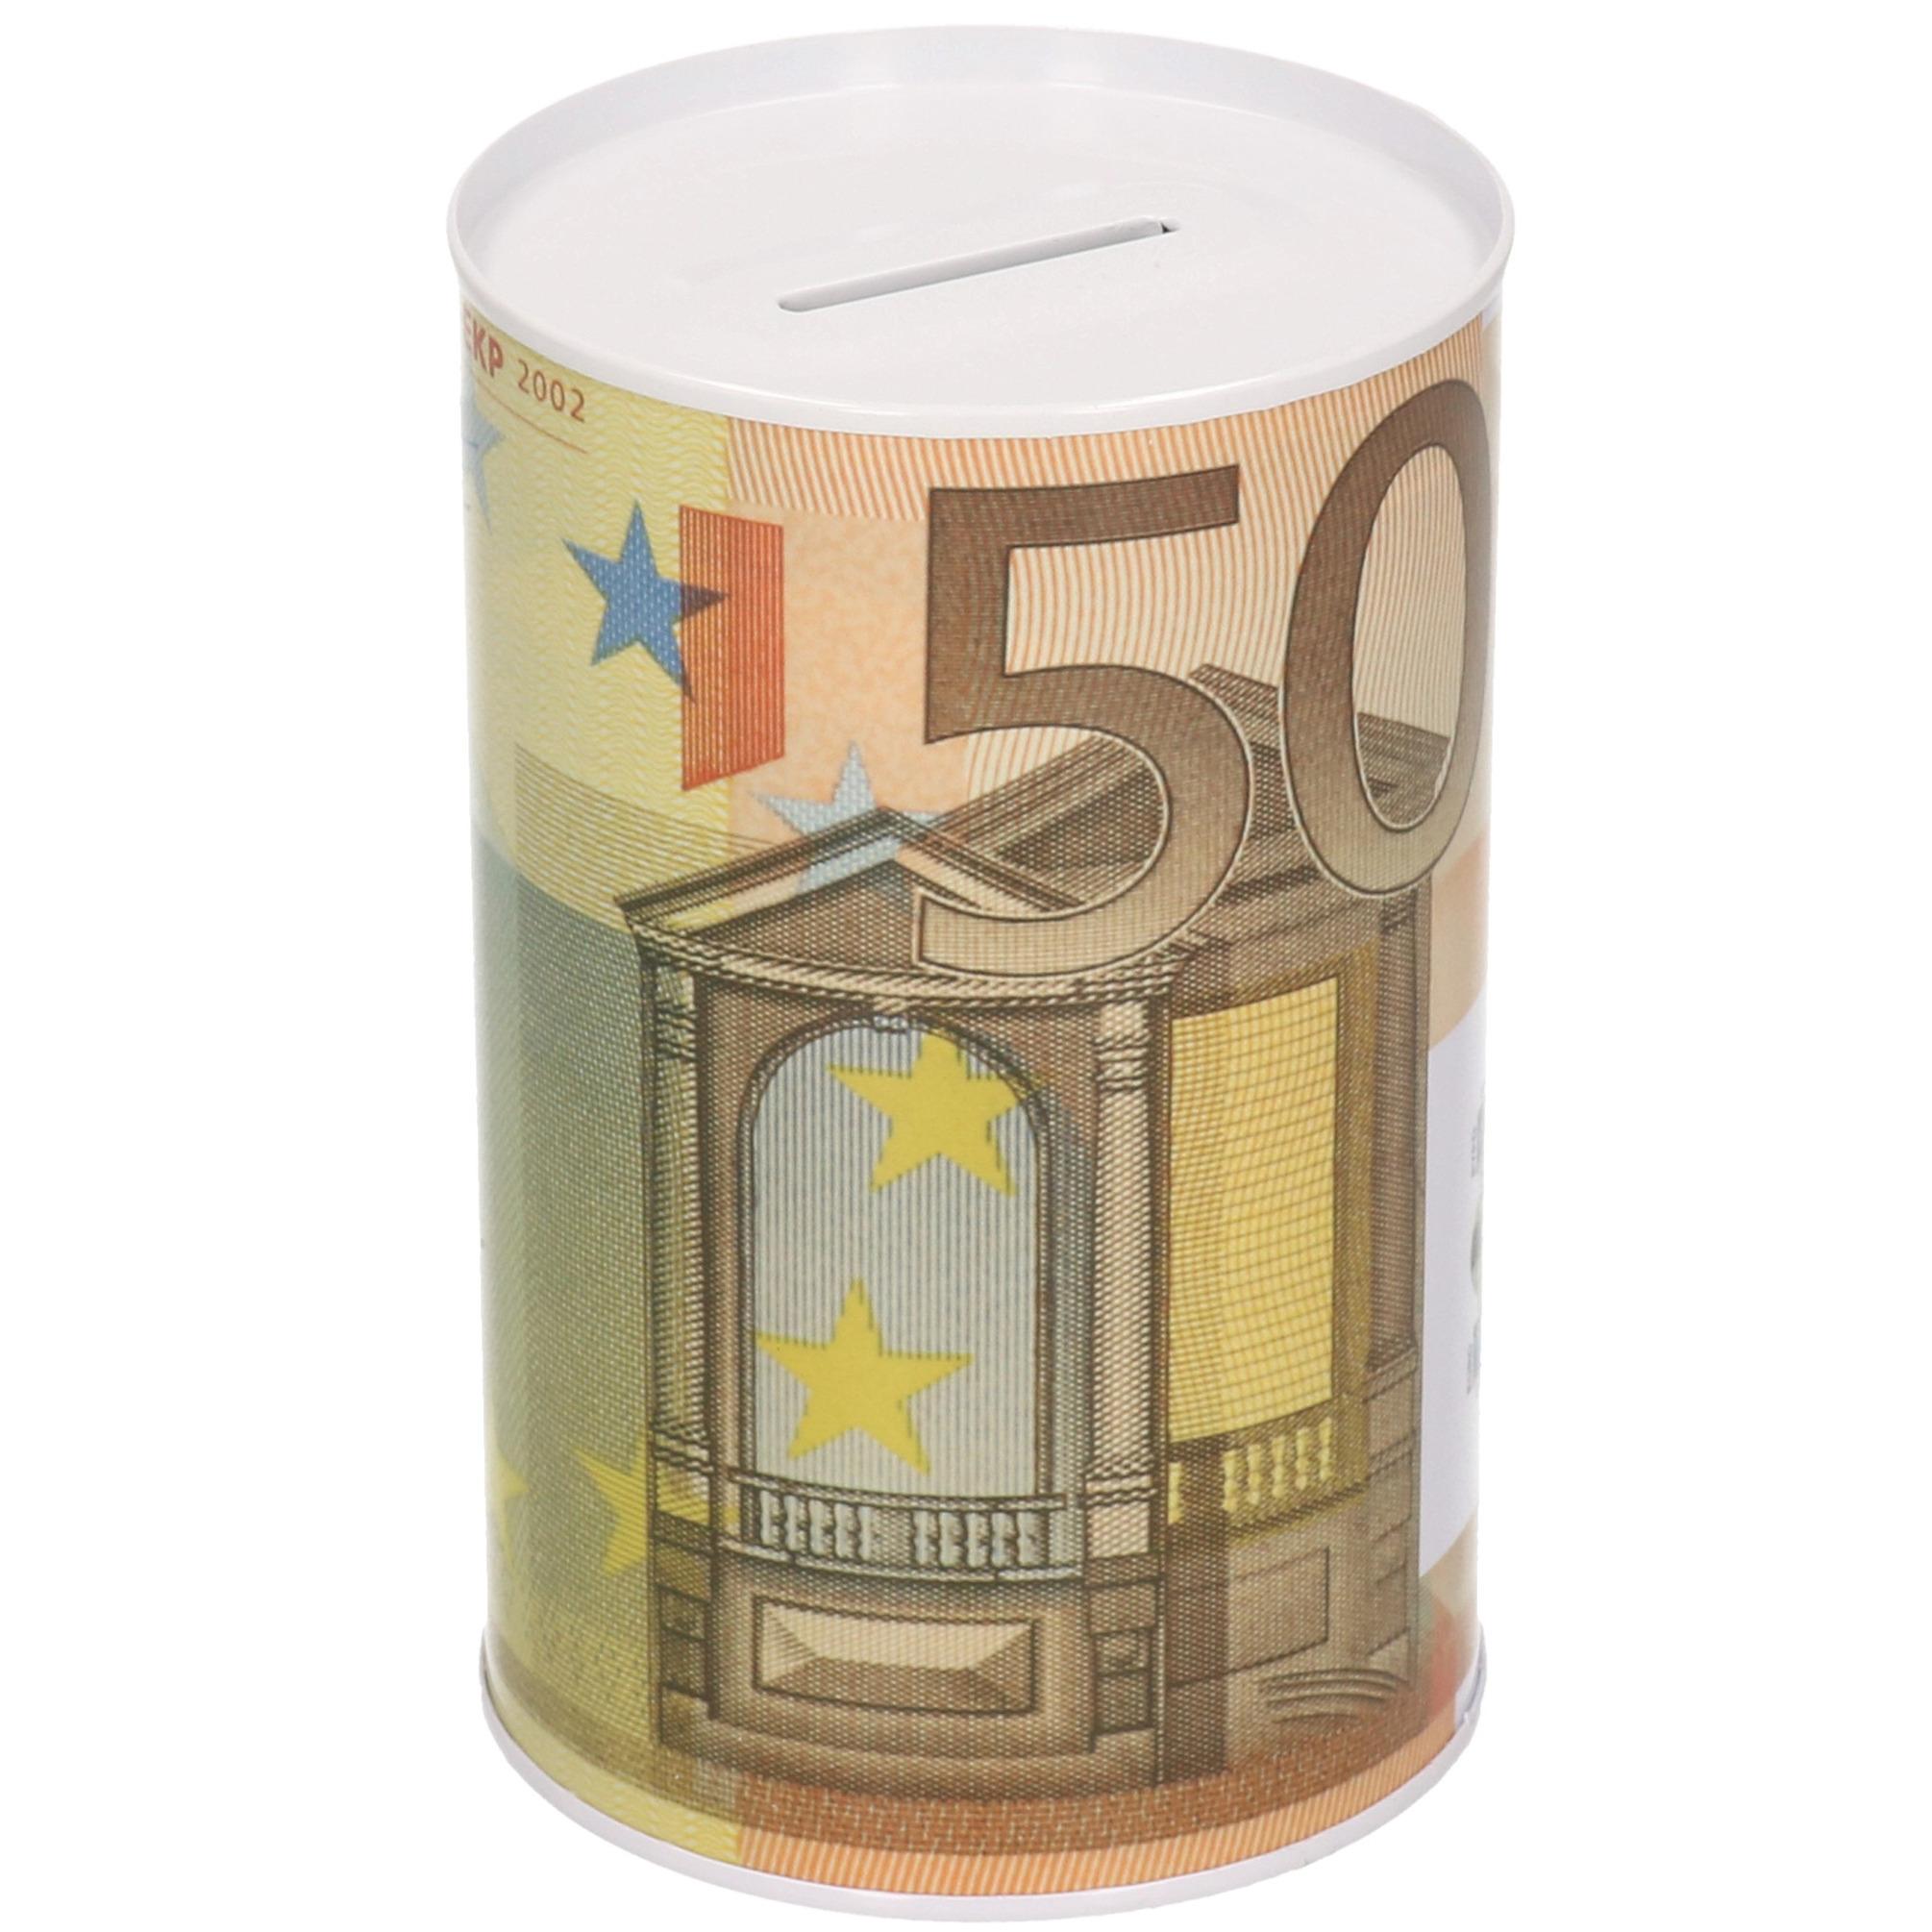 Spaarpot blik 50 euro biljet 8 x 15 cm